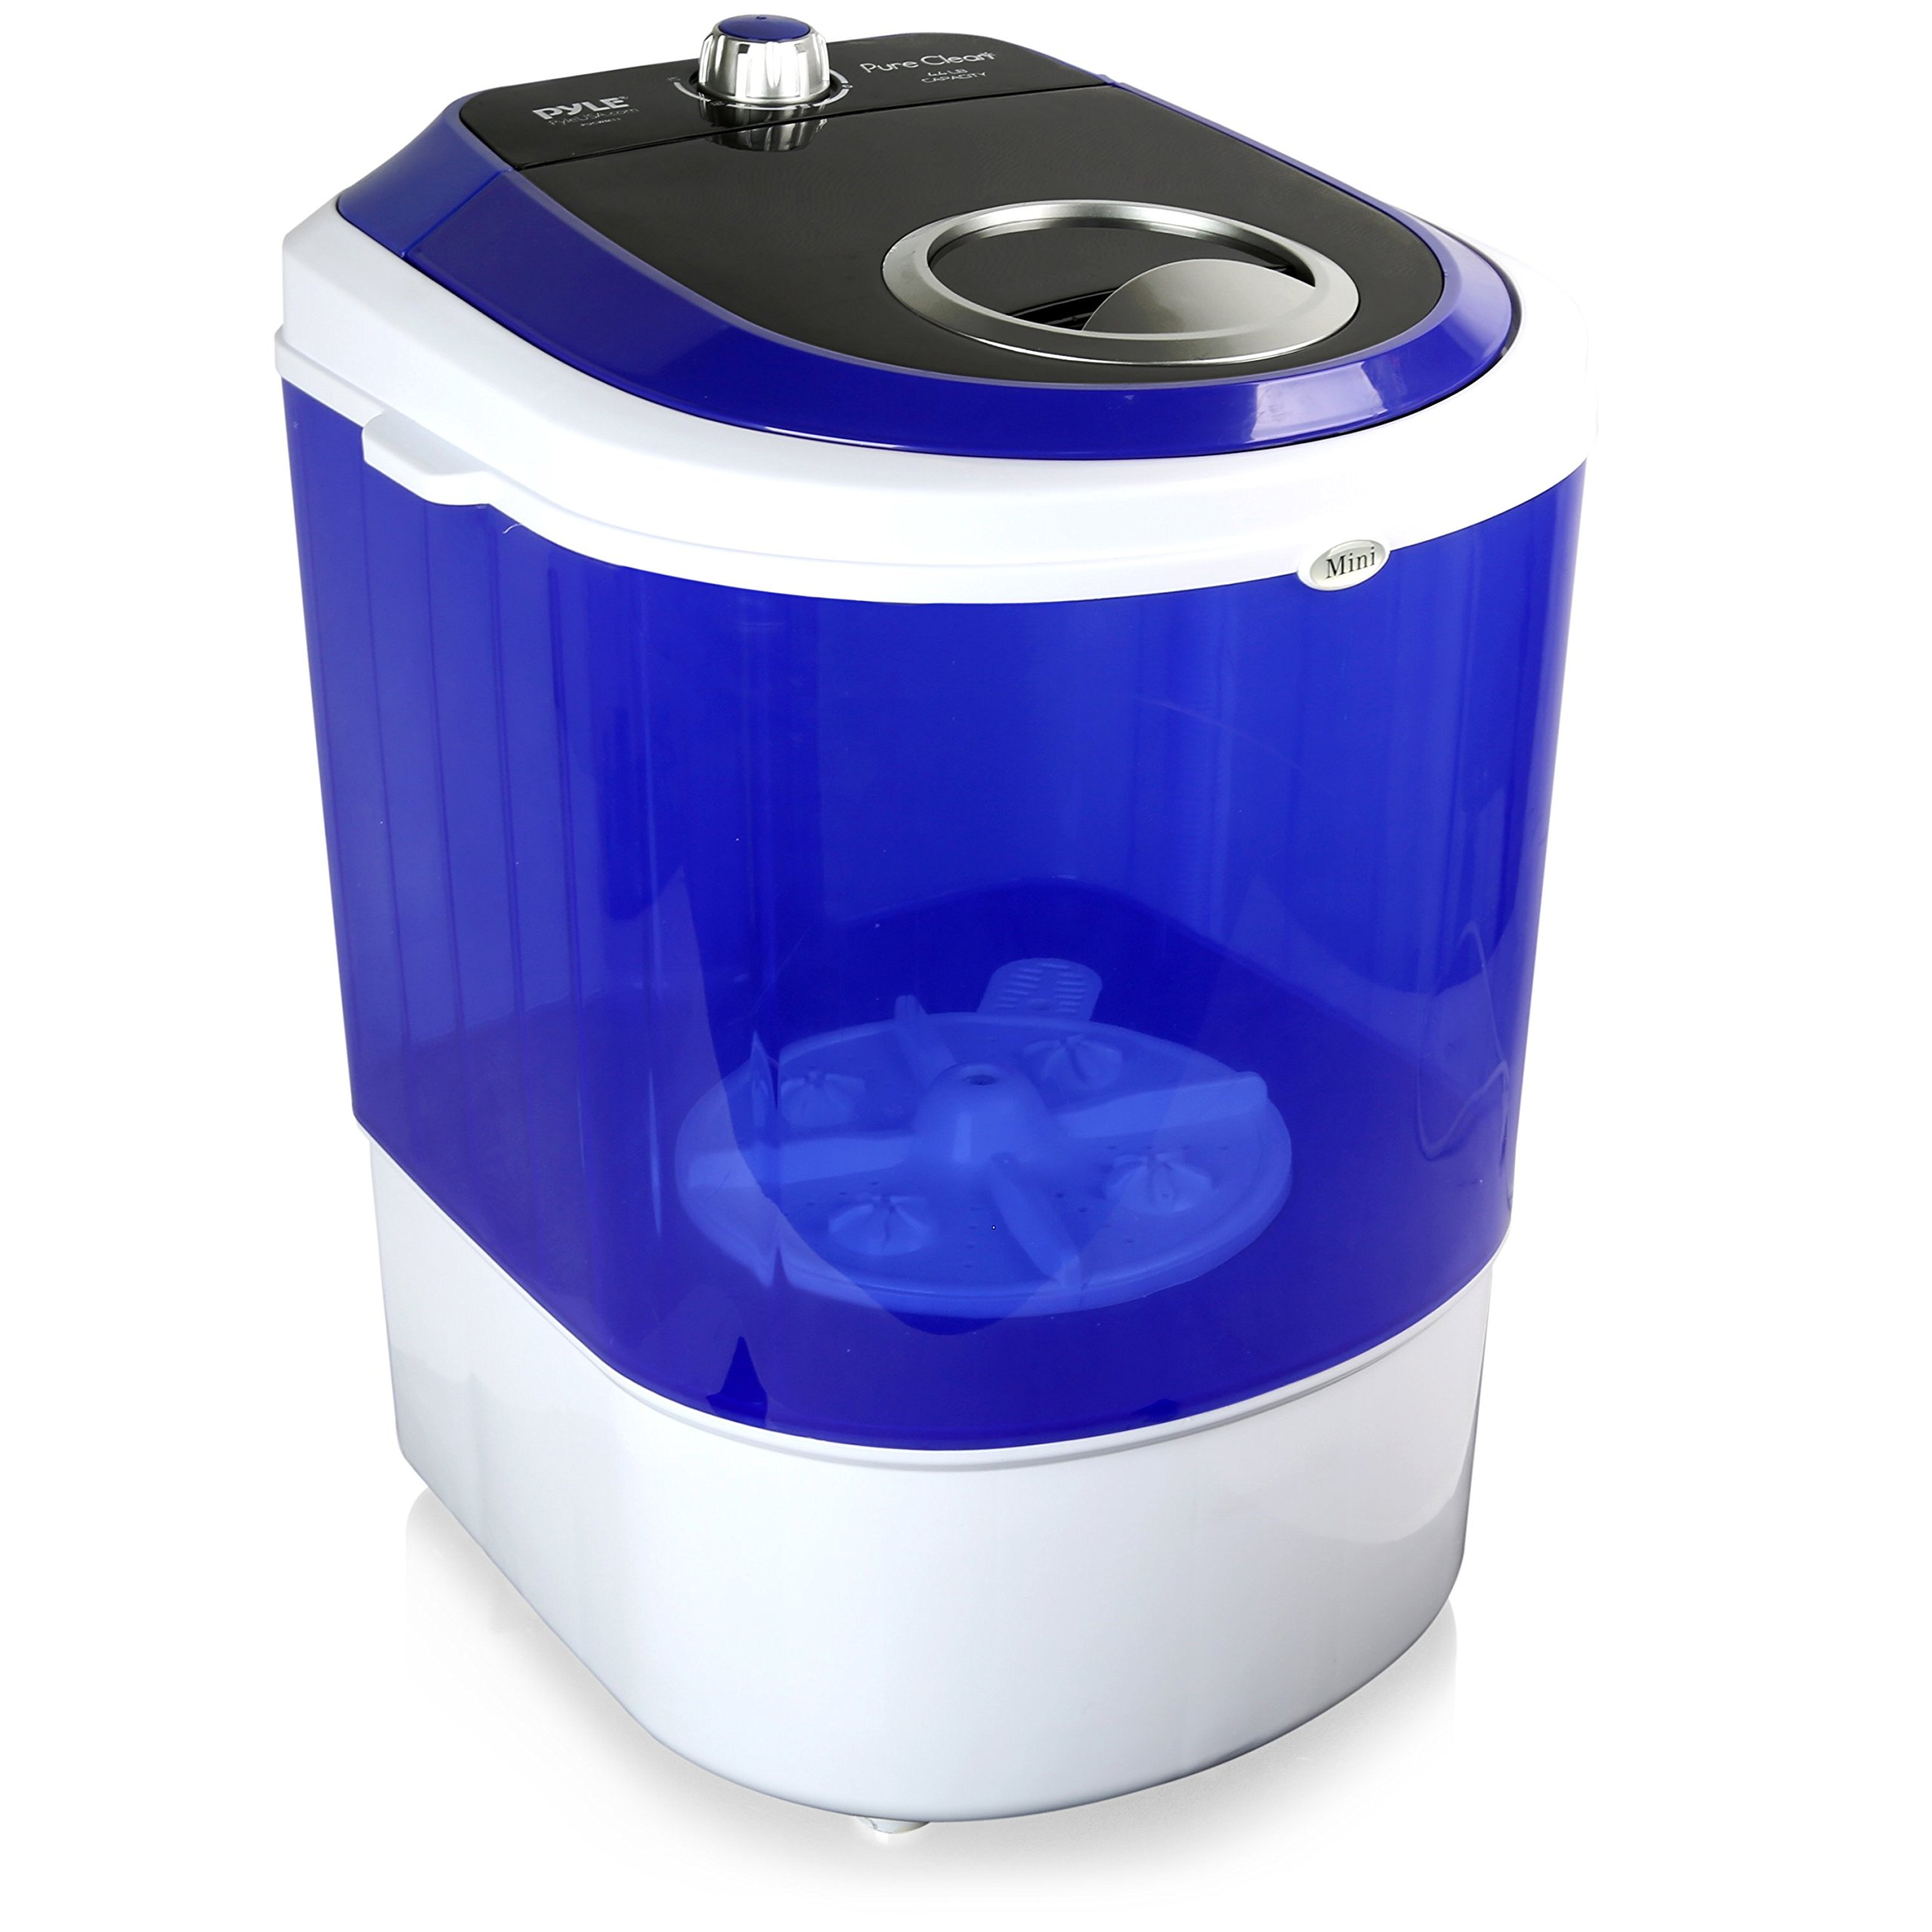 Pyle Mini Portable Washing Machine